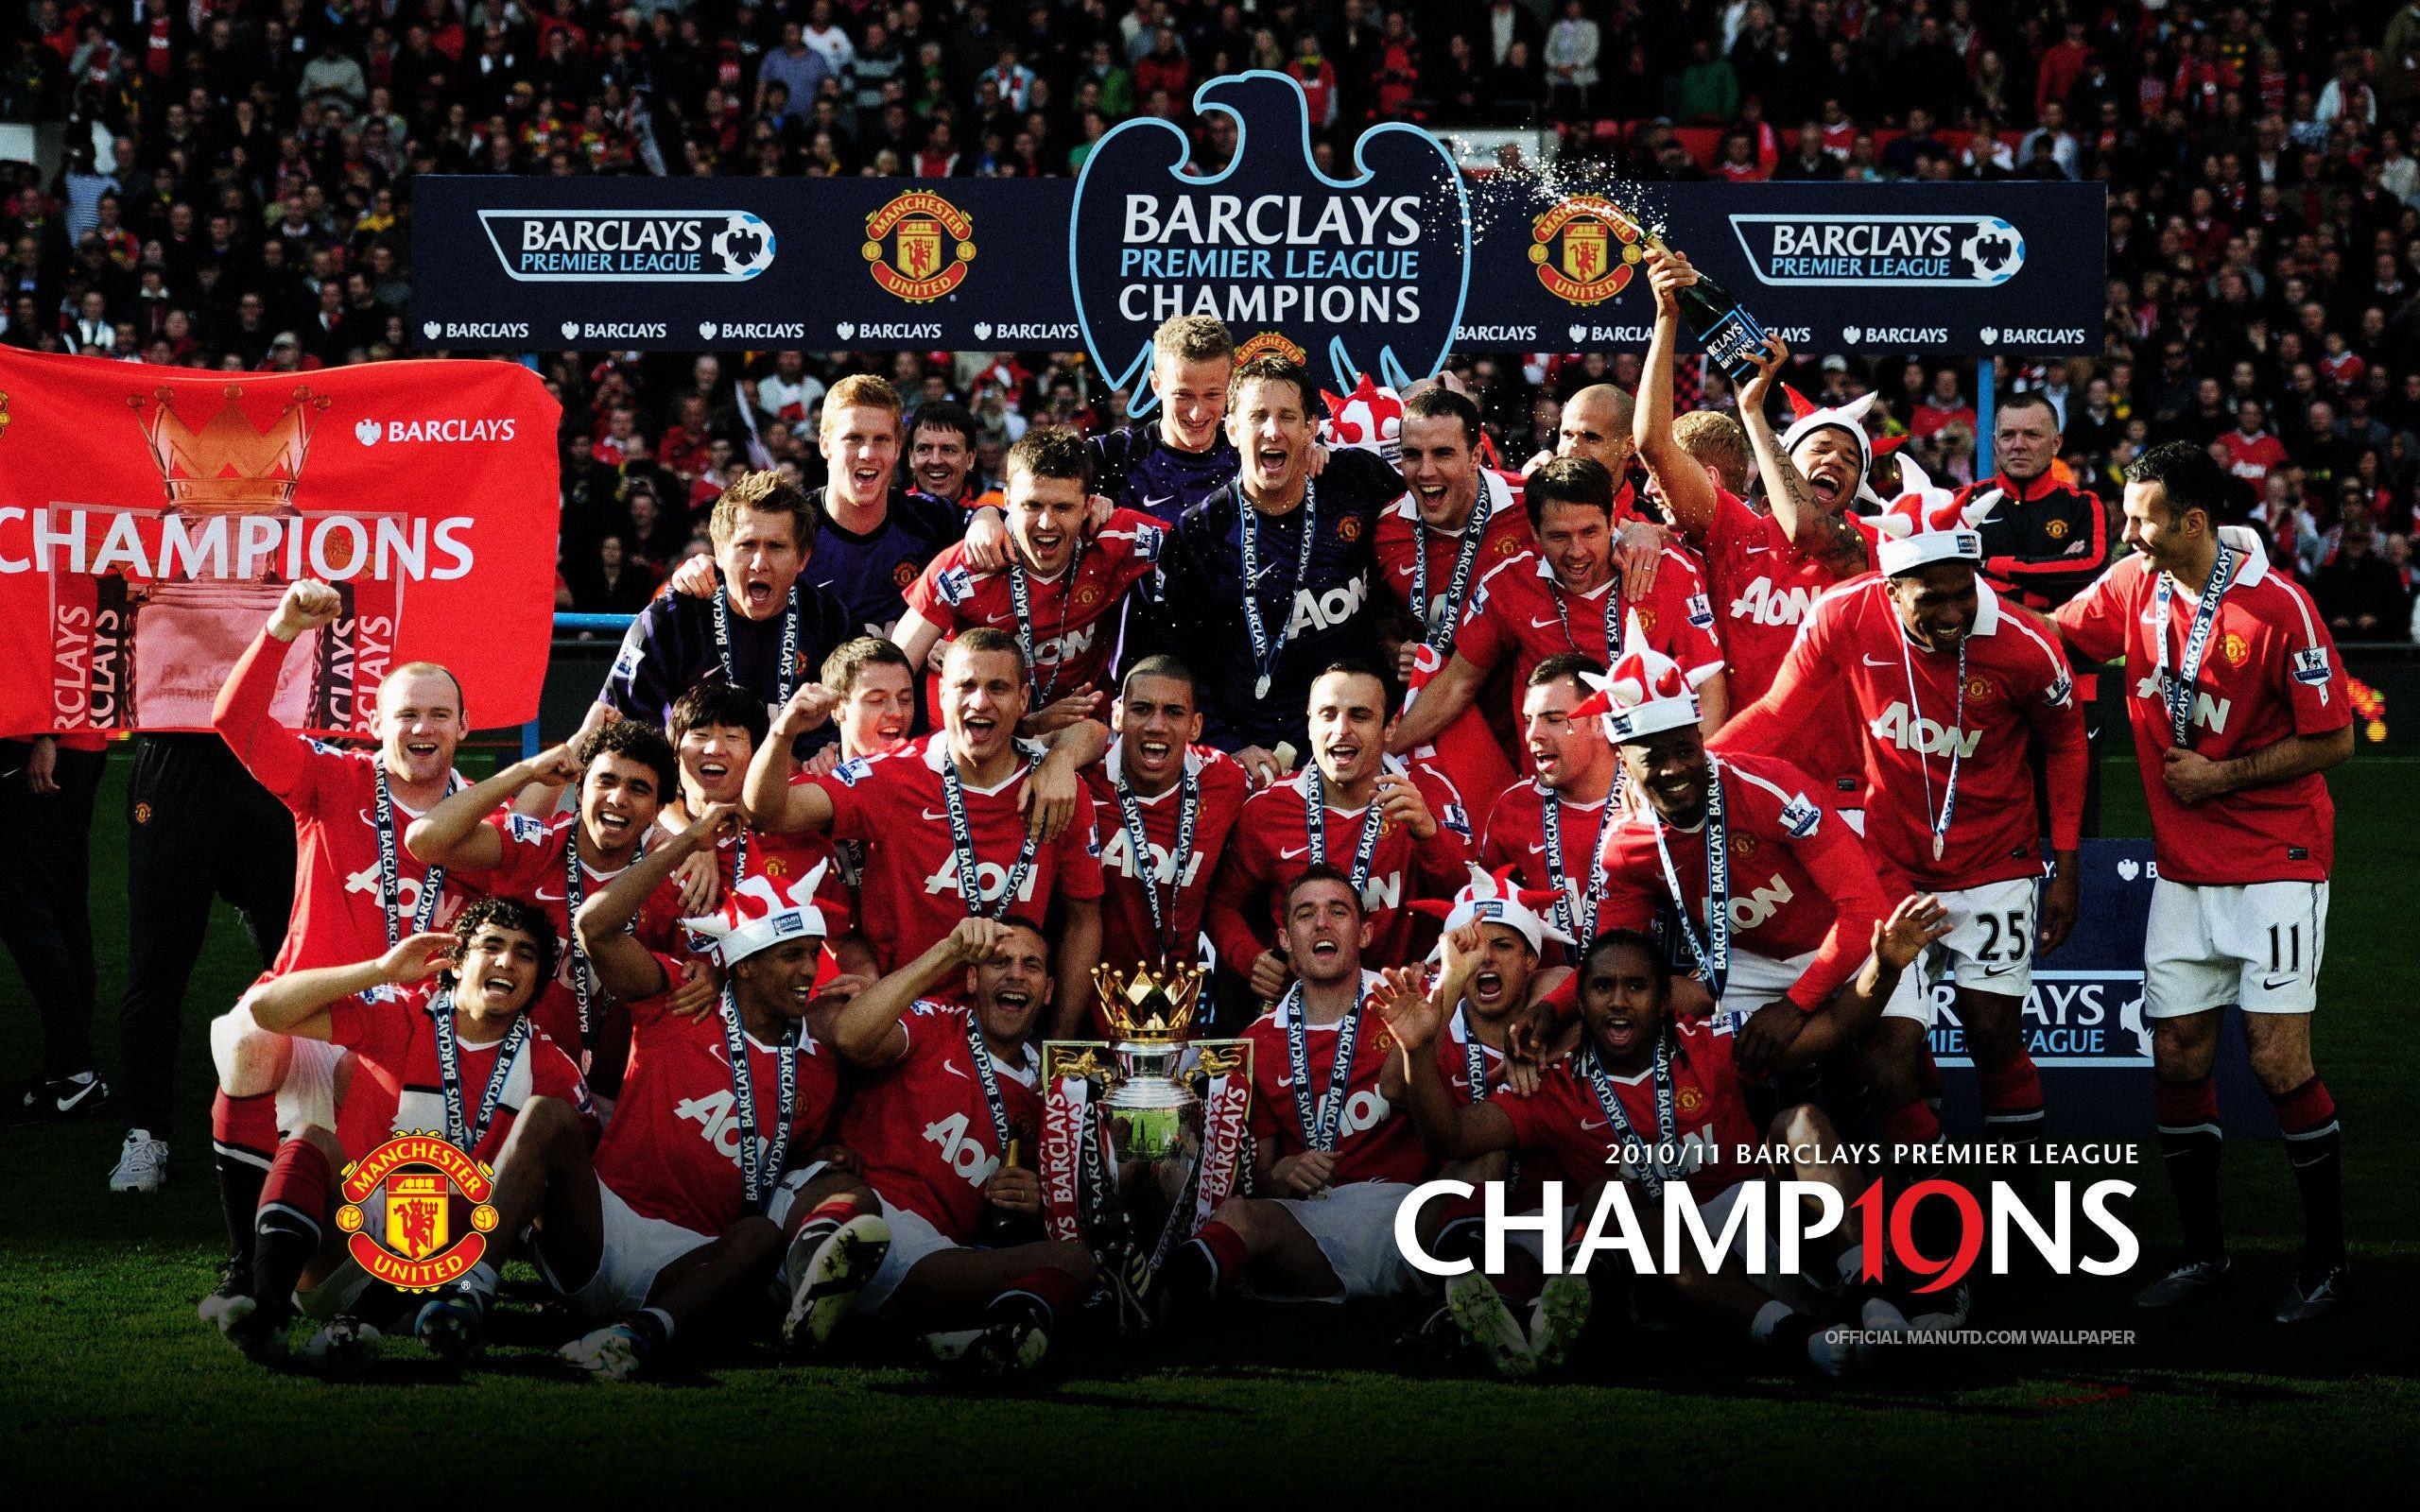 Manchester United Wallpaper 3d 2018 62 Images